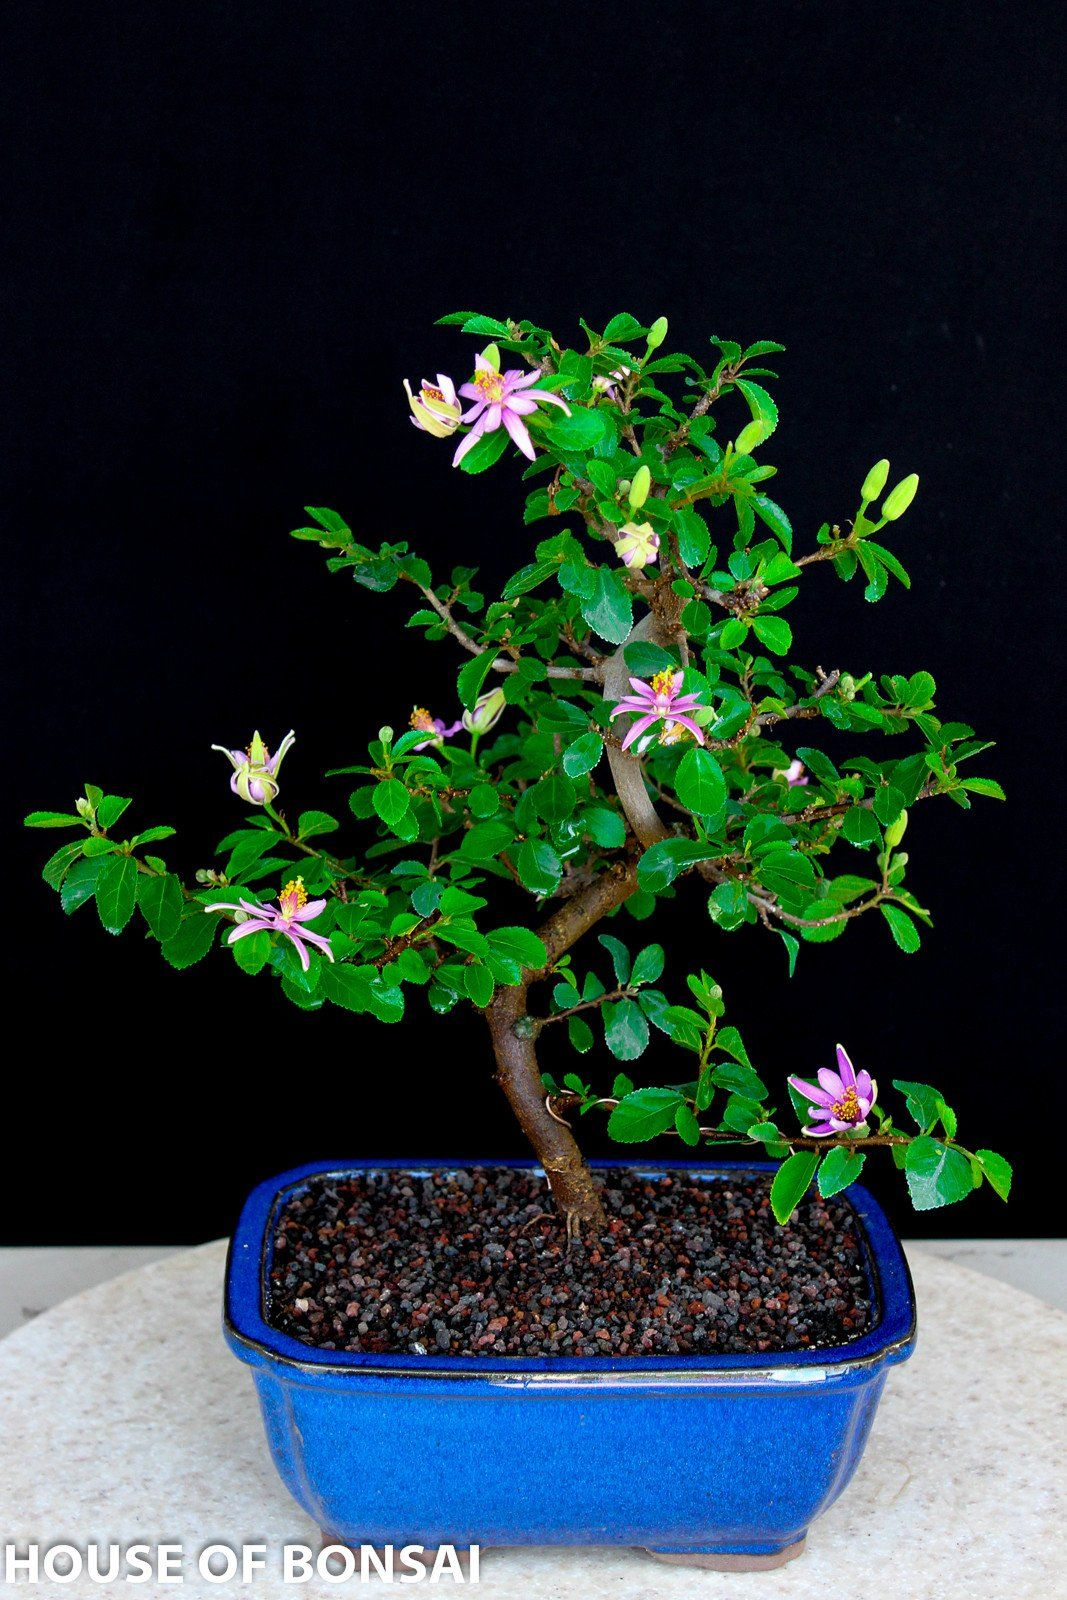 Lavender Star Flower Bonsai Tree In Ceramic Pot Bonsai Tree Bonsai Tree Care Indoor Bonsai Tree